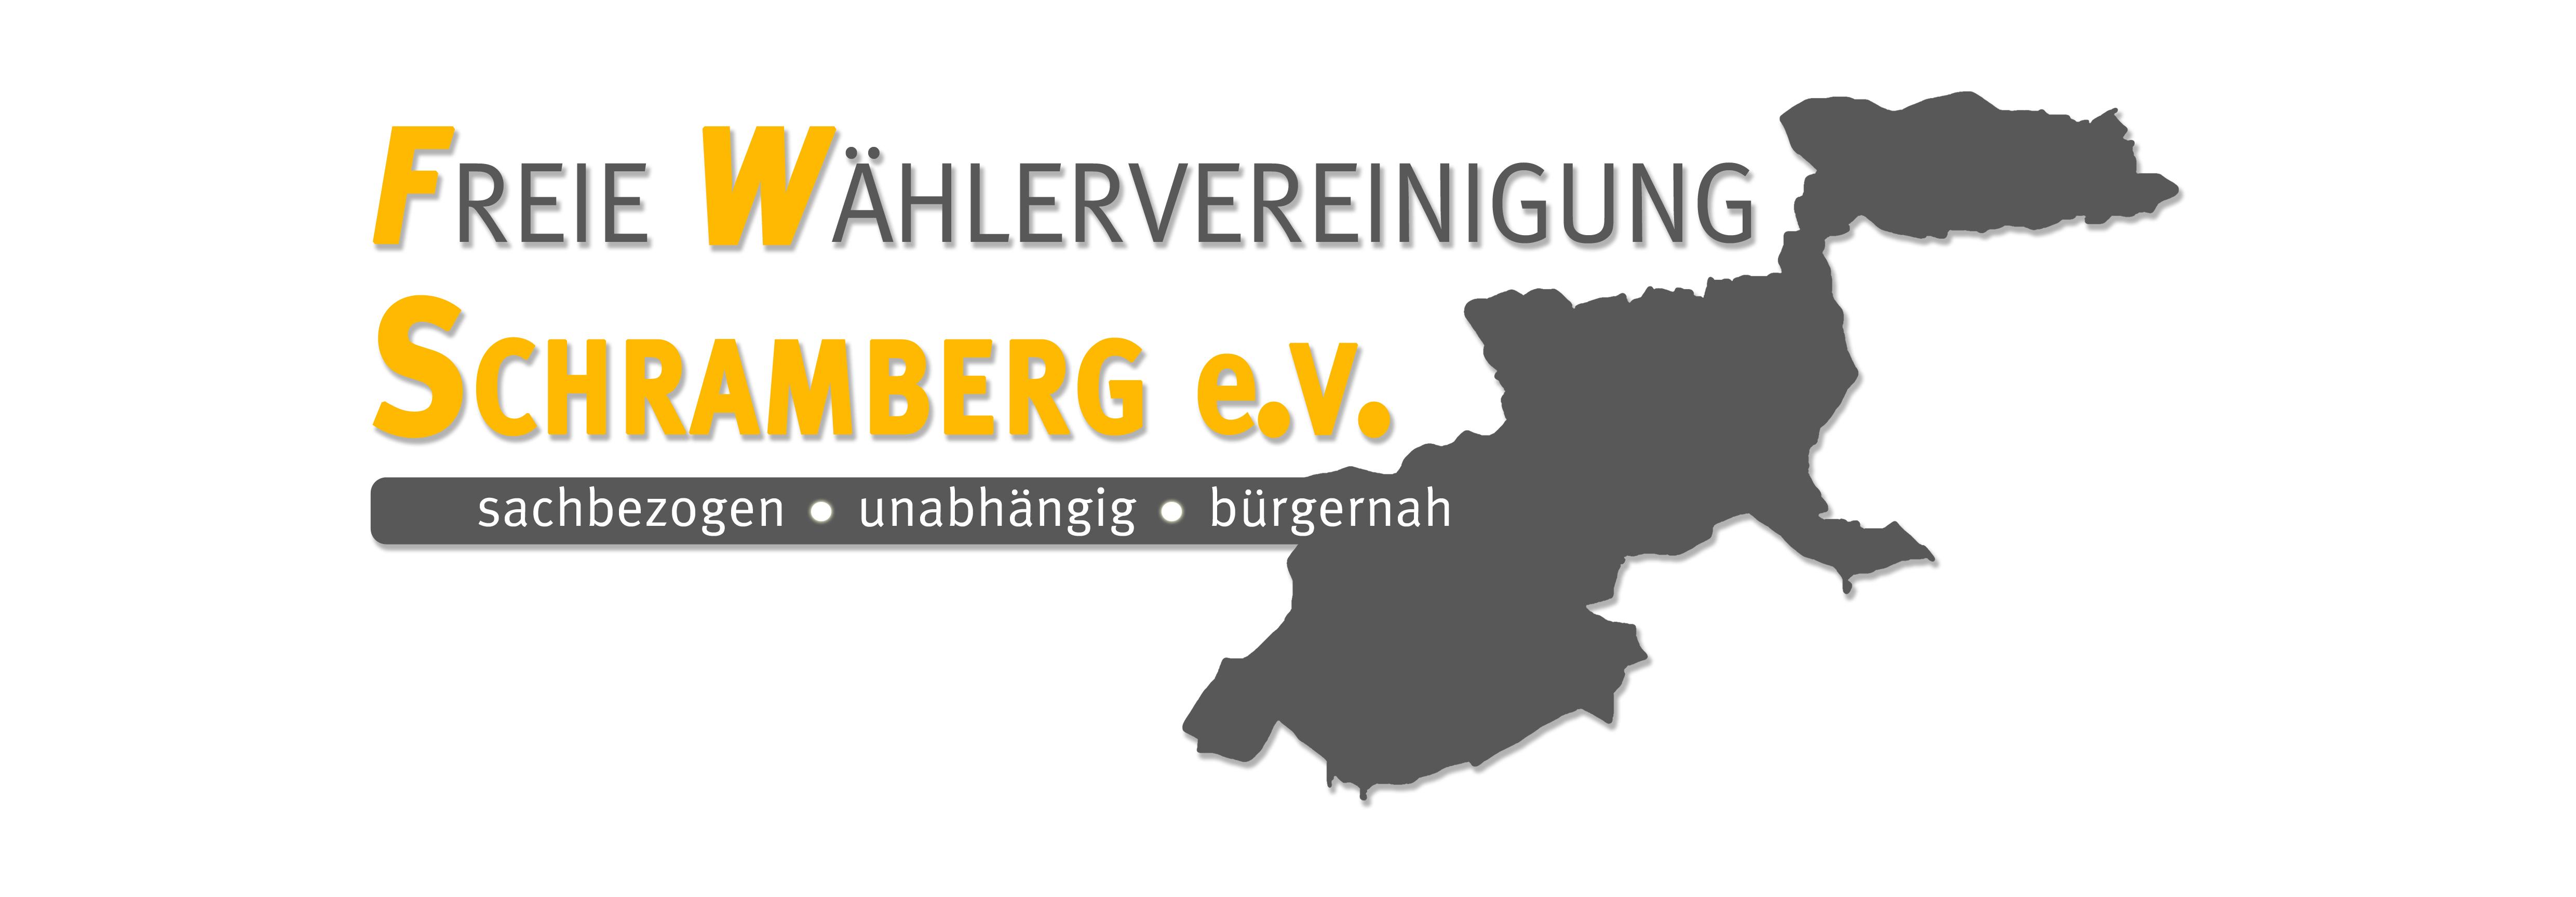 Freie Wählervereinigung Schramberg e.V.